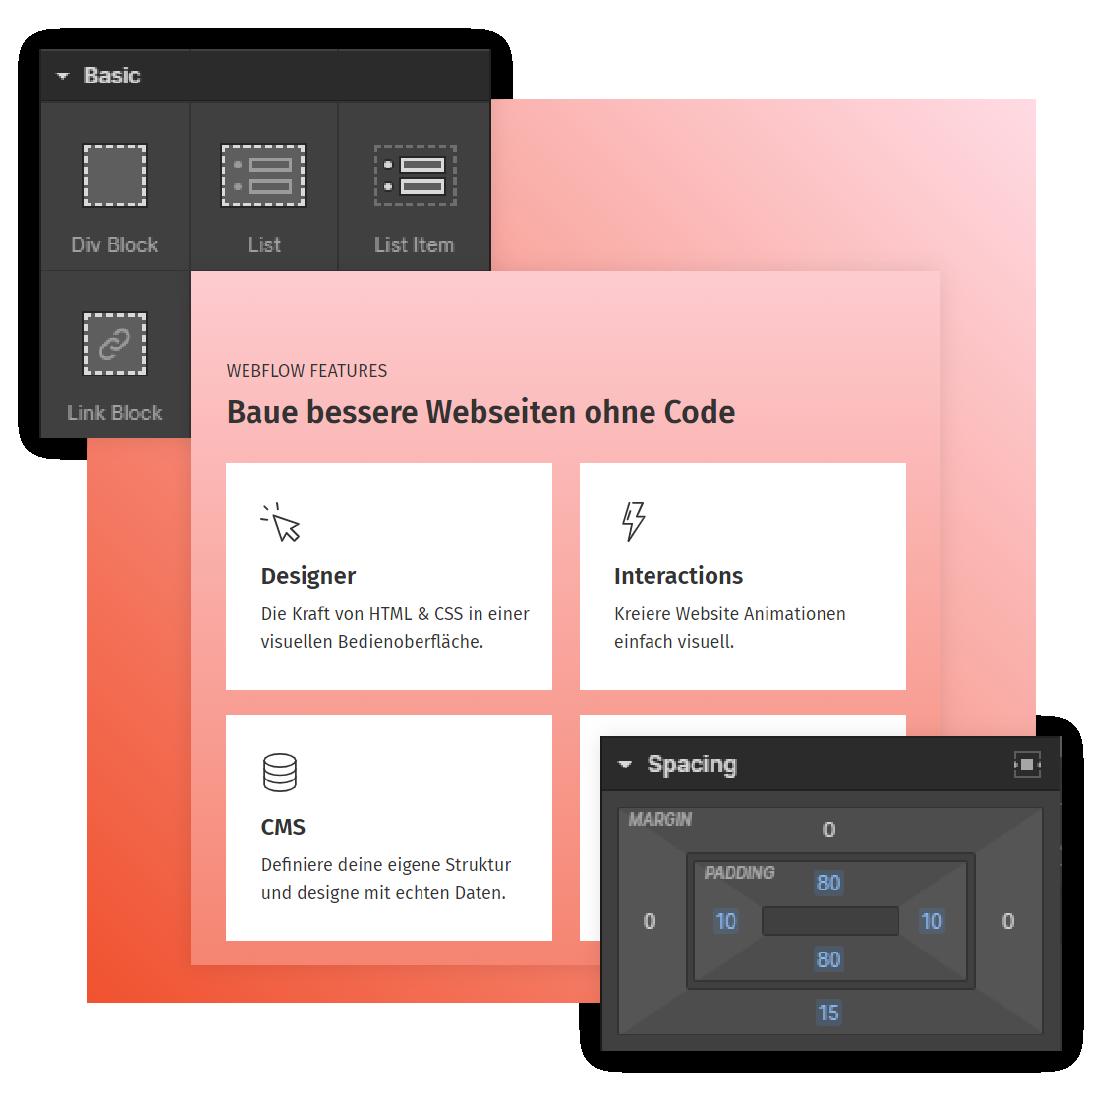 Visuelles Webdesign Tool Webflow